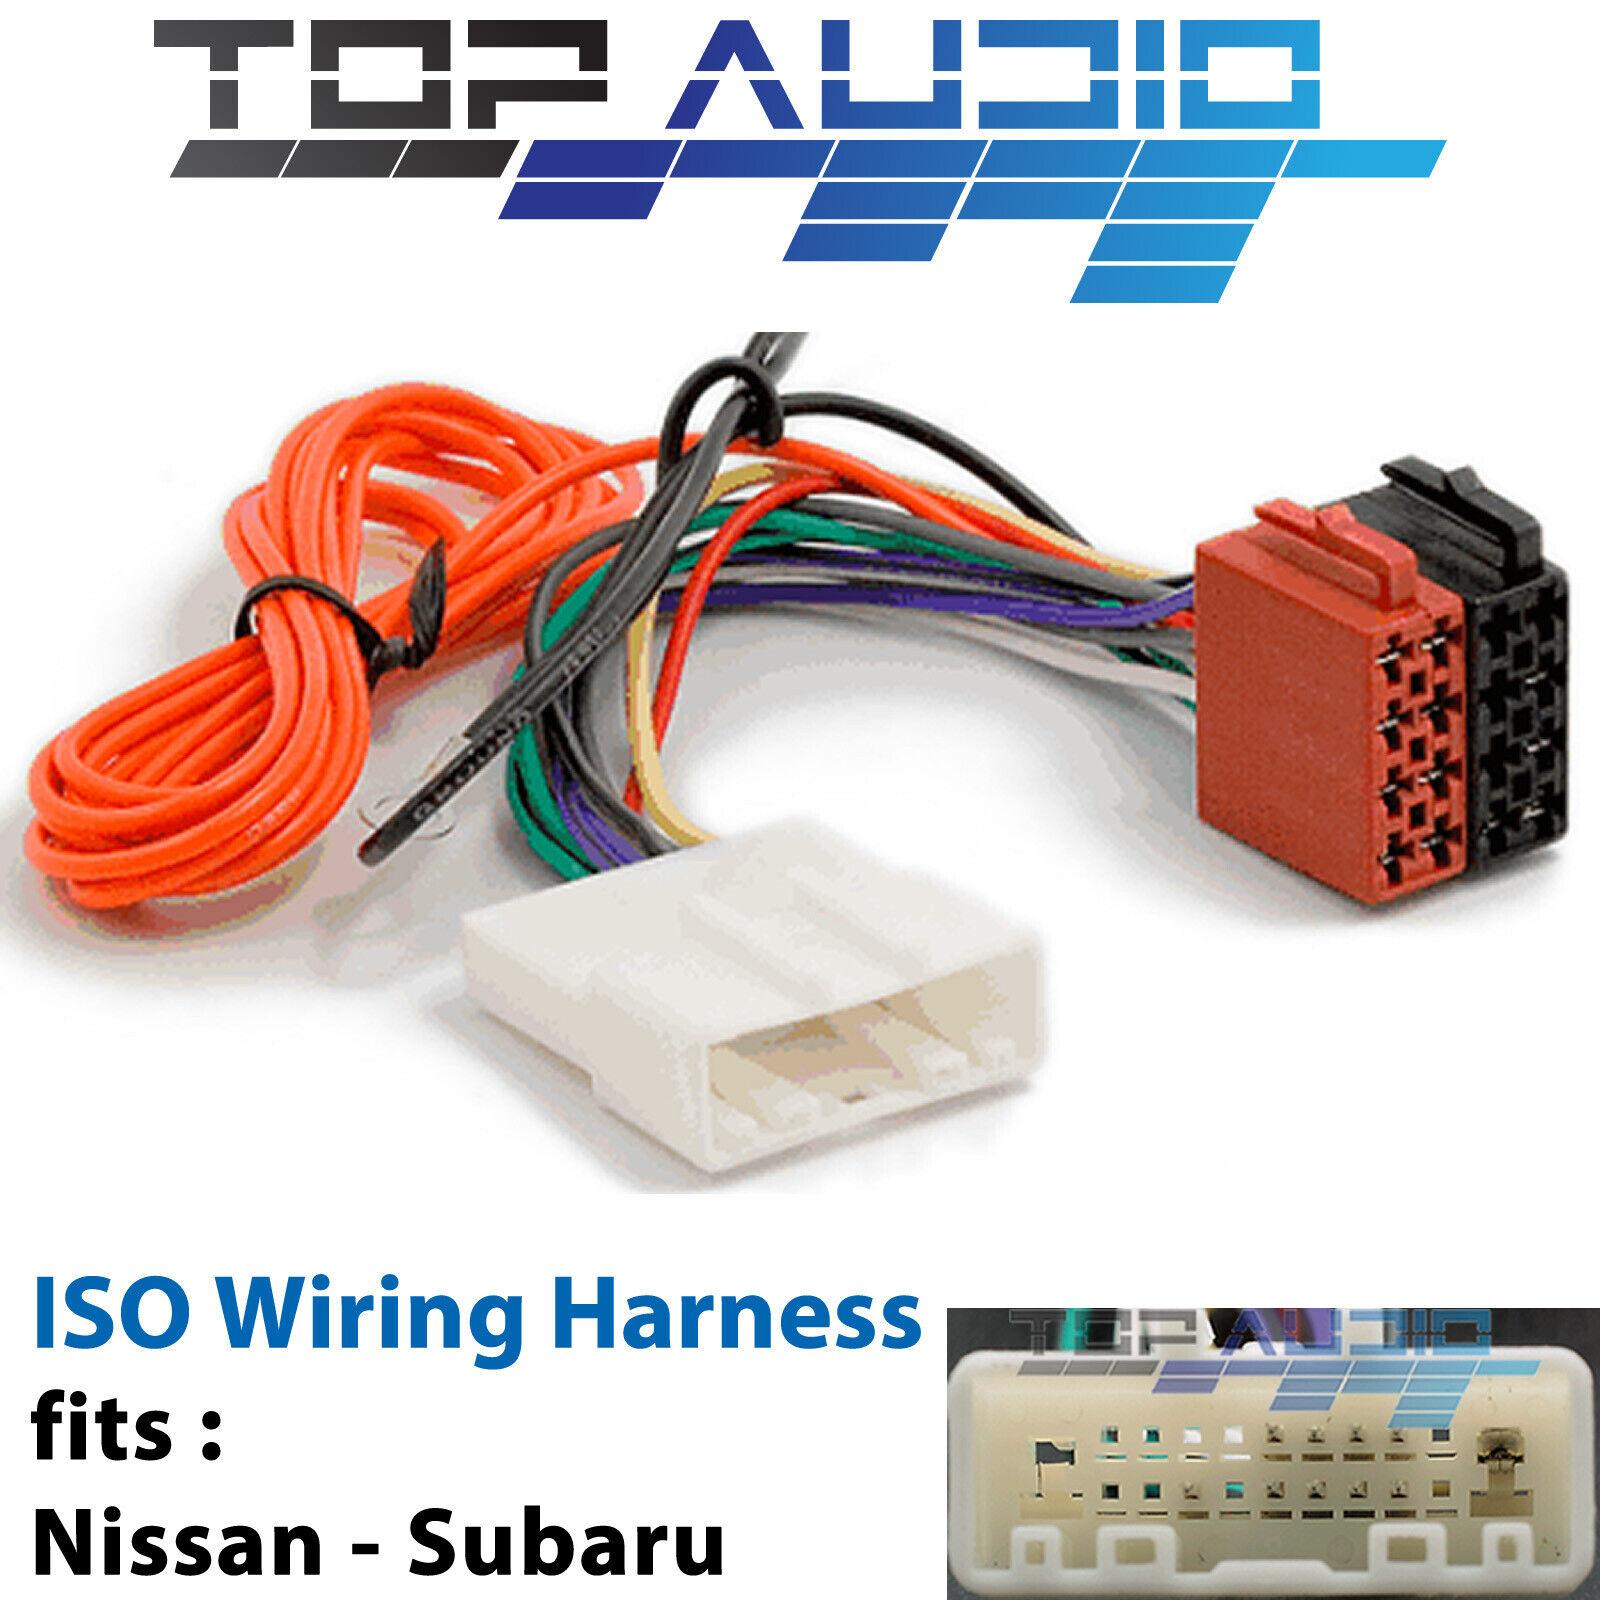 fit SUBARU ISO wiring harness adaptor cable connector lead loom plug